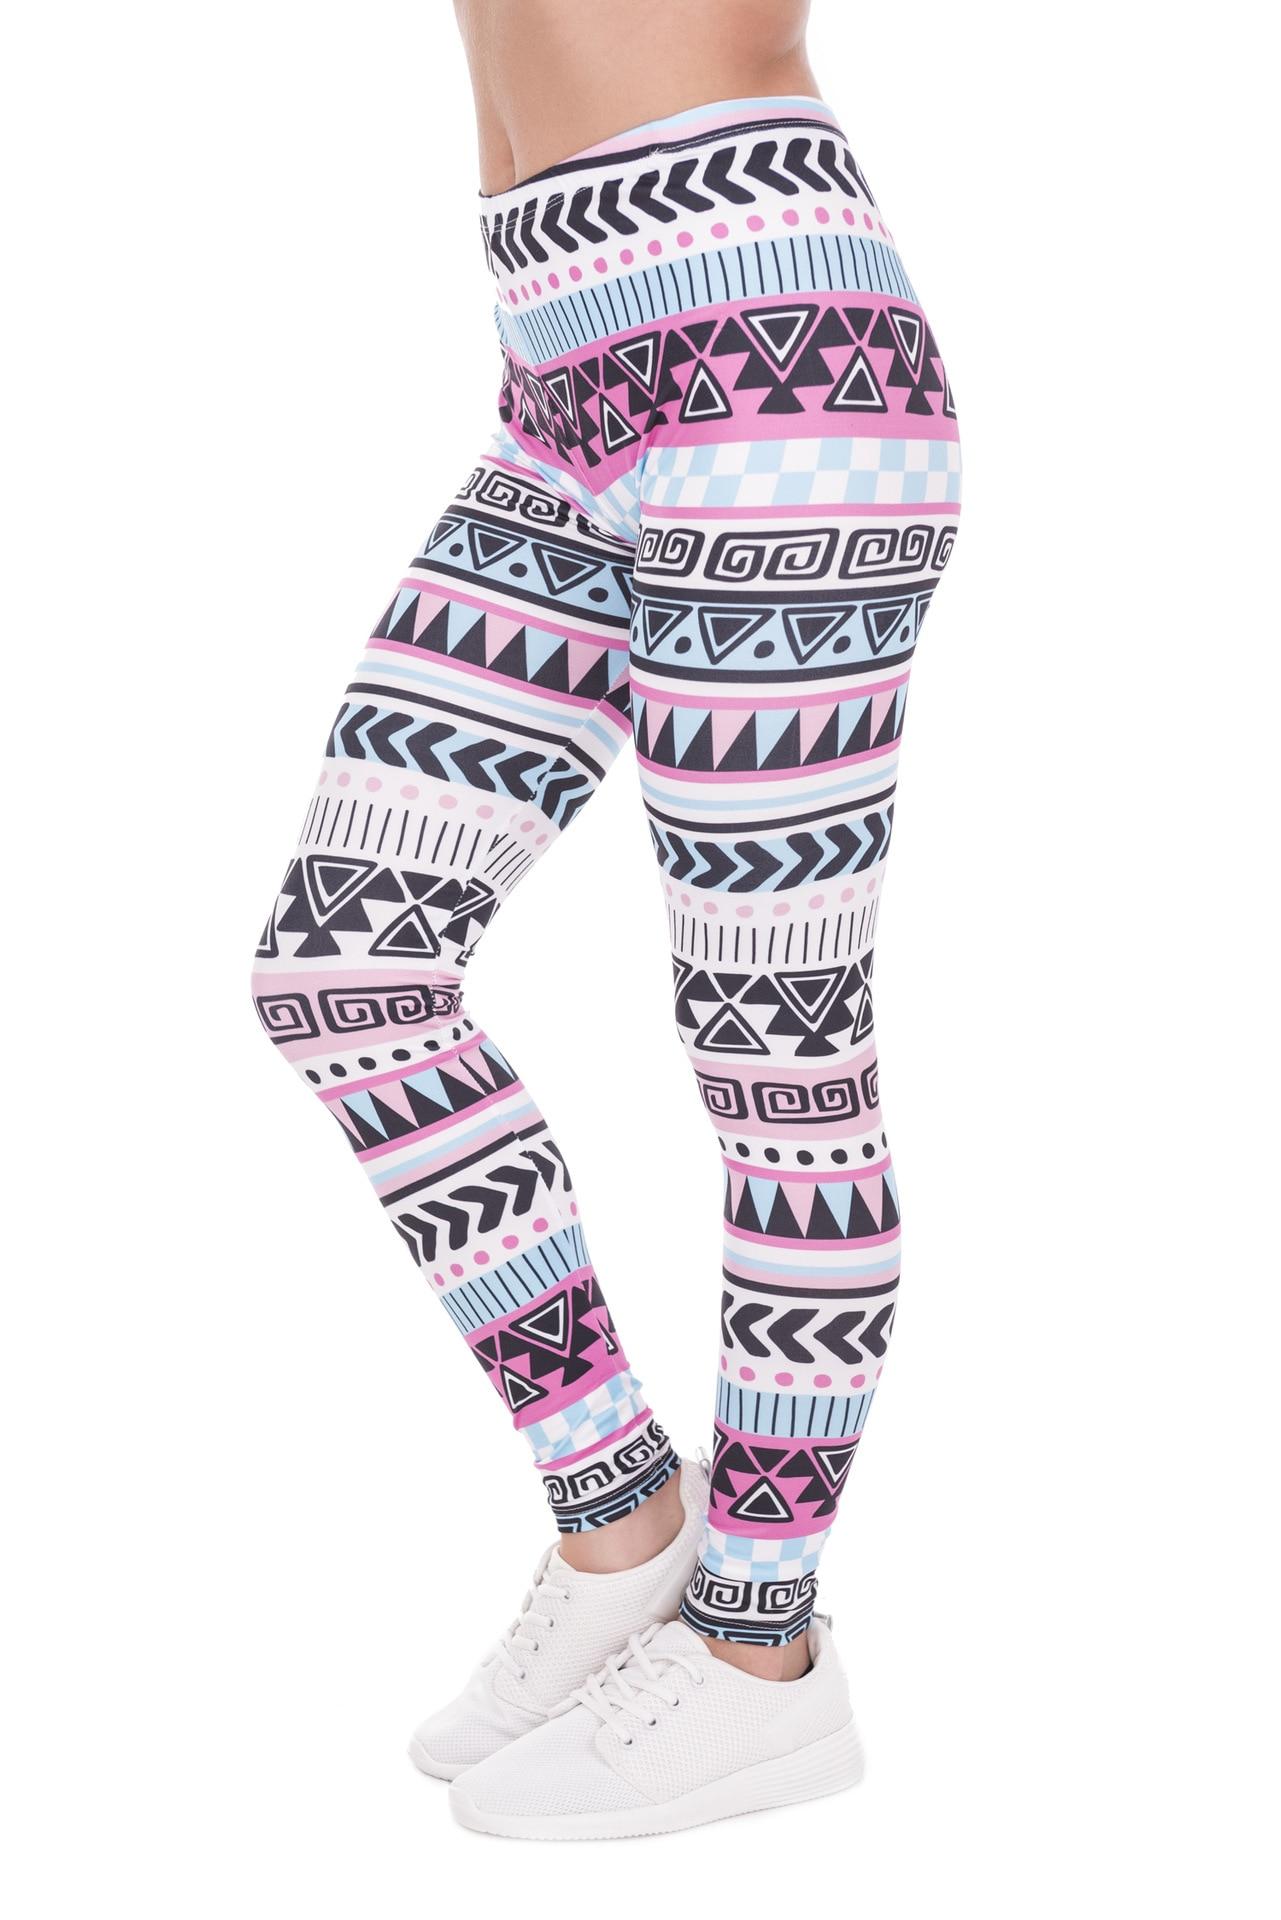 Geometric Stripes Europe And America Printing Ninth Pants High-waisted Sports Large Size Leggings Women's Leggings 41584